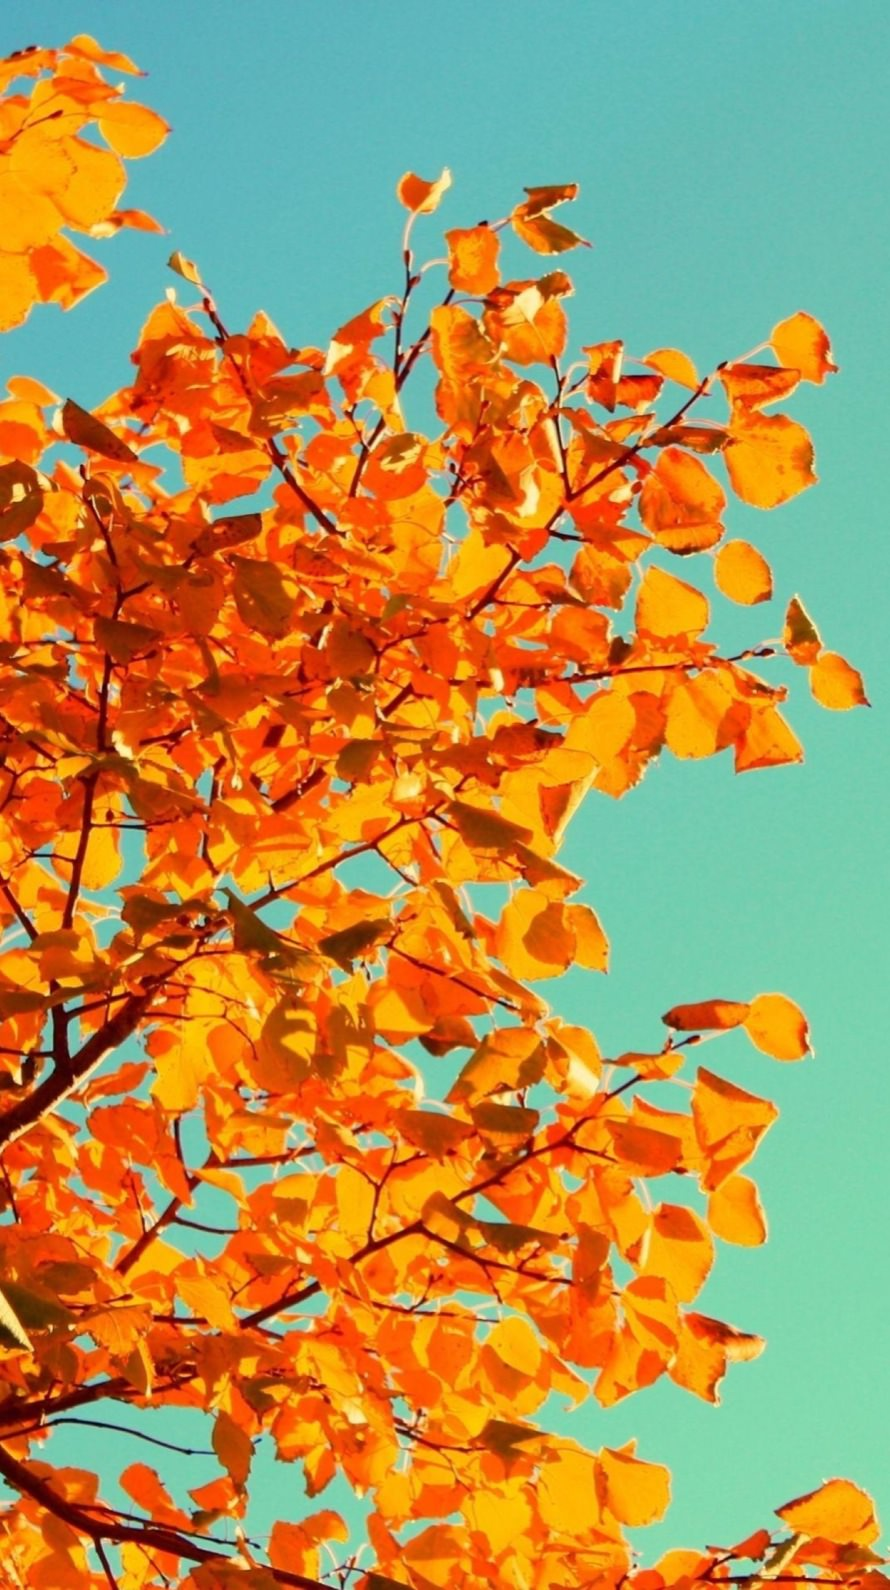 Tumblr Fall Iphone Wallpaper HD Wallpapers on picsfaircom 890x1590